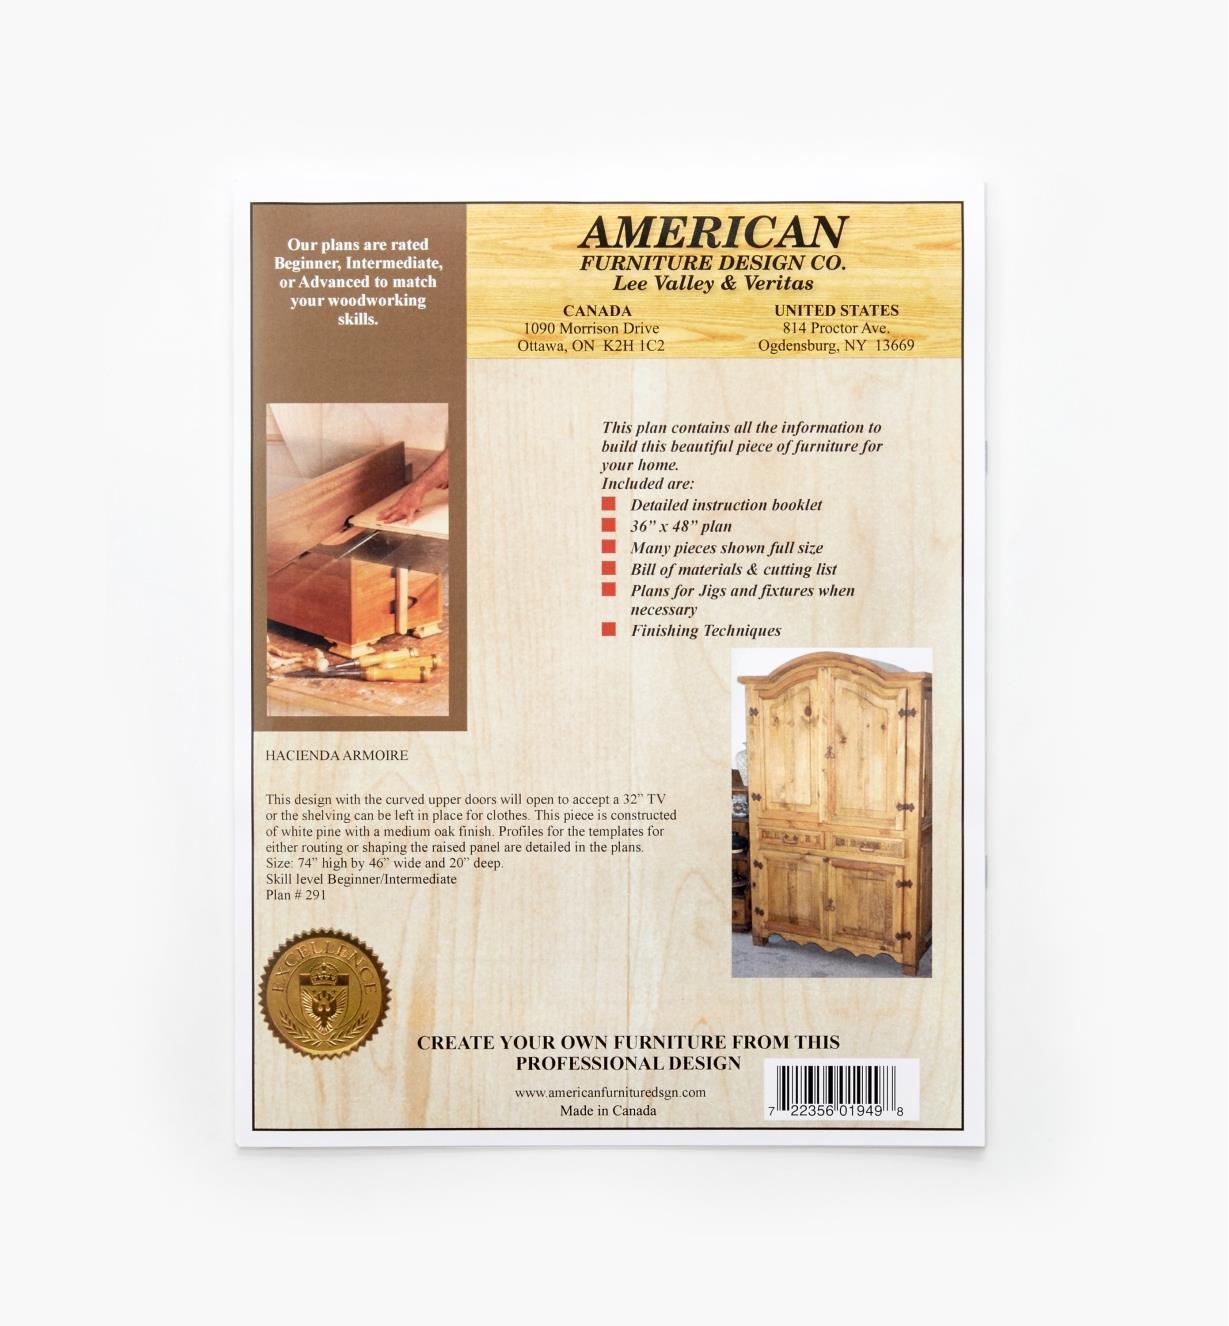 01L5094 - Hacienda Armoire Plan